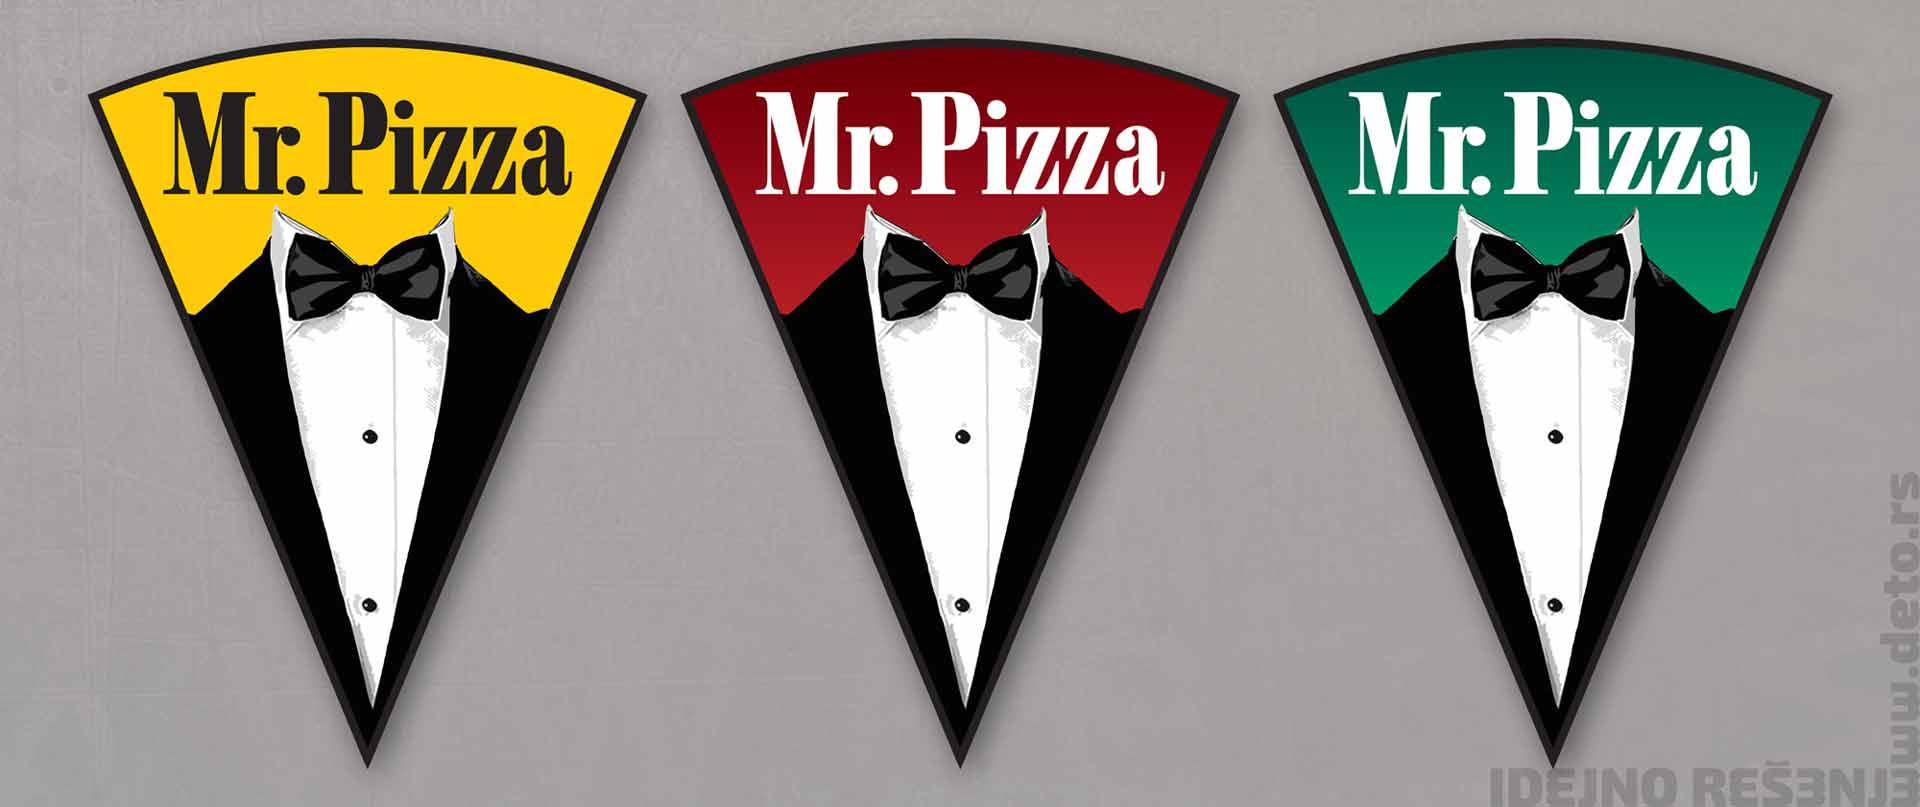 Dizajn -  Idejno rešenje, logo za piceriju / Mr. Pizza